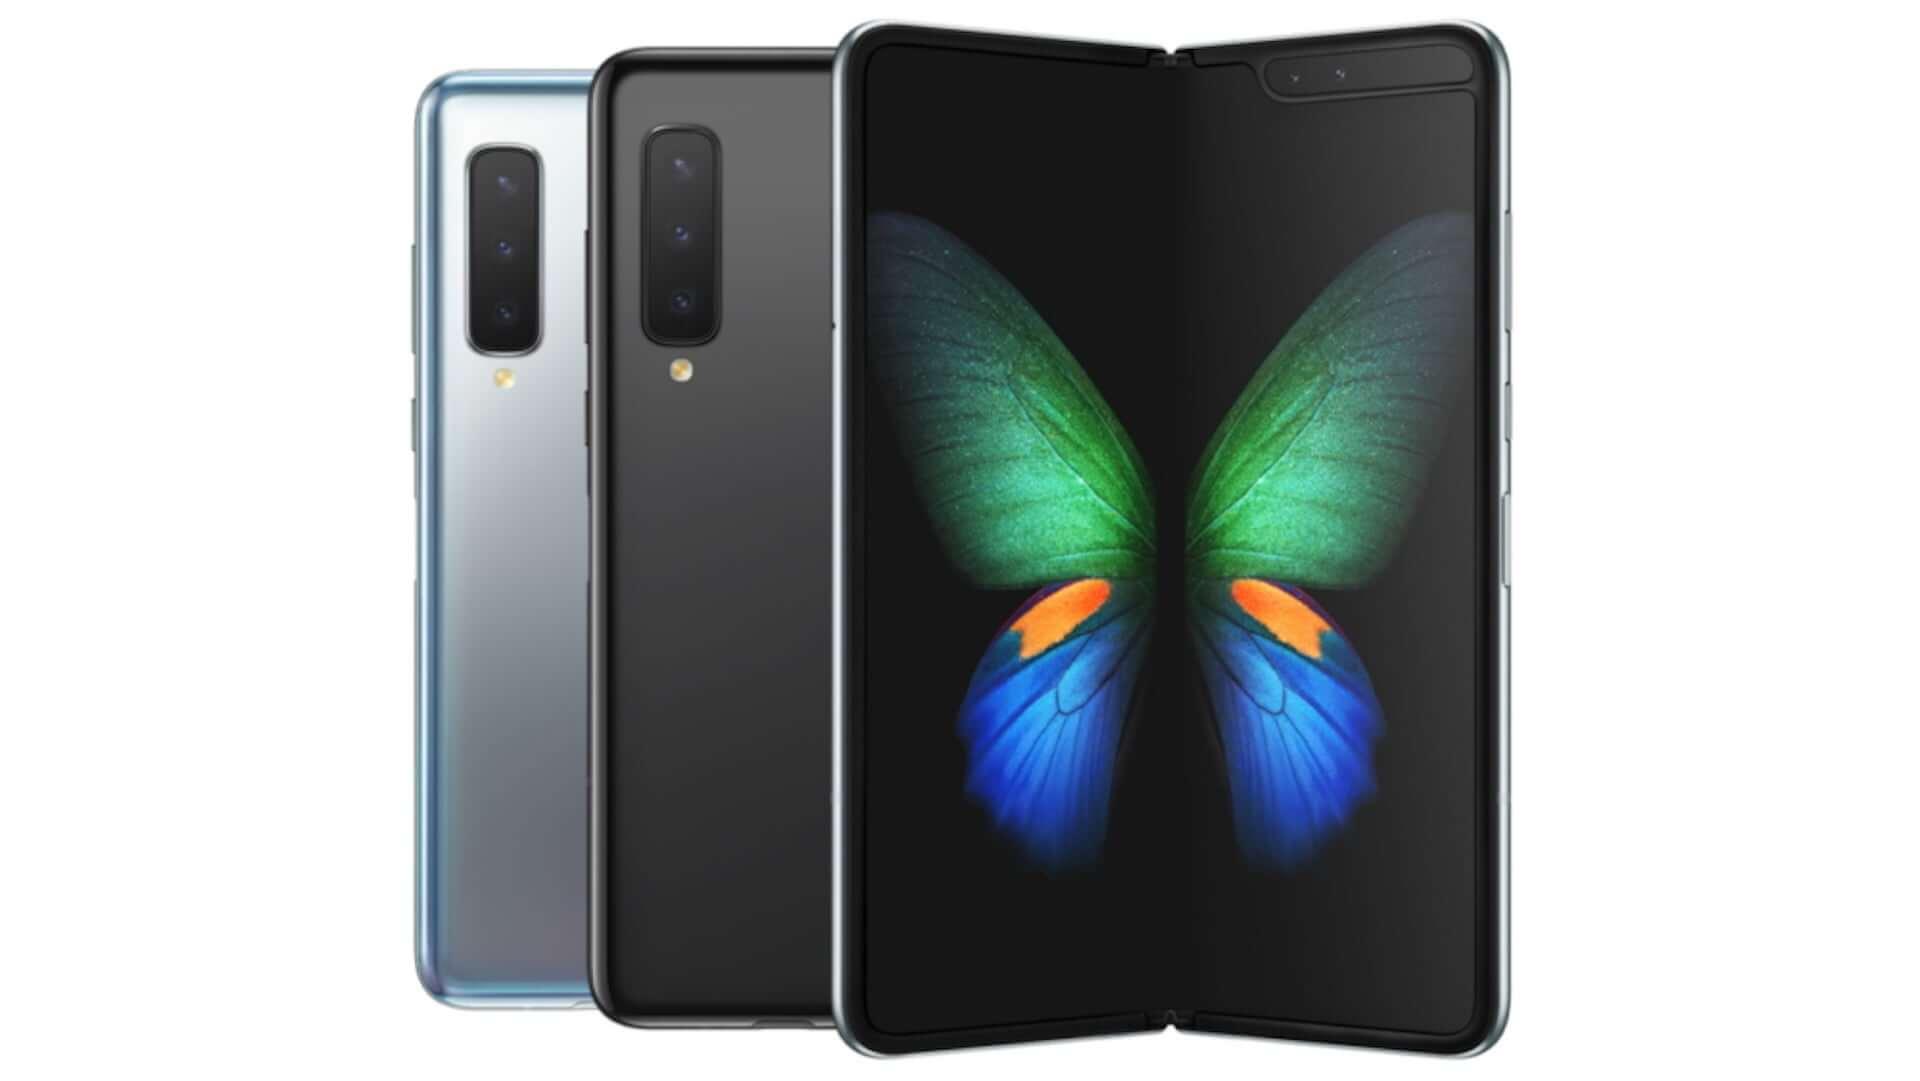 Galaxy Fold、ついに明日6日発売!Samsungが発表|日本での発売は? tech190905_galaxyfold_1-1920x1081